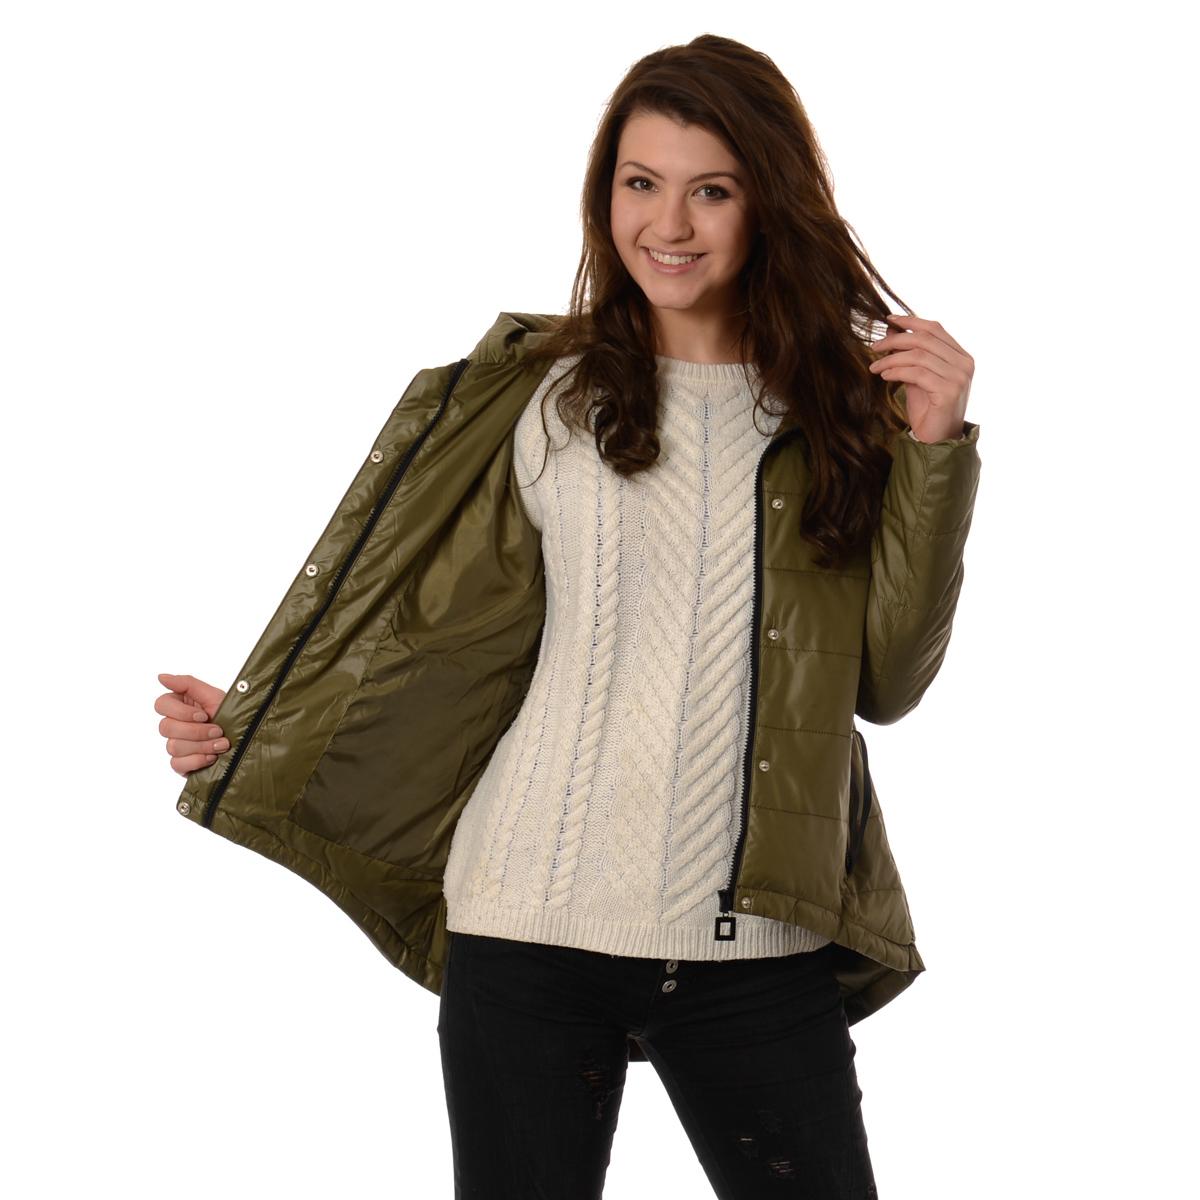 Damska kurtka jesienna # parka # cotton _3xl (46)